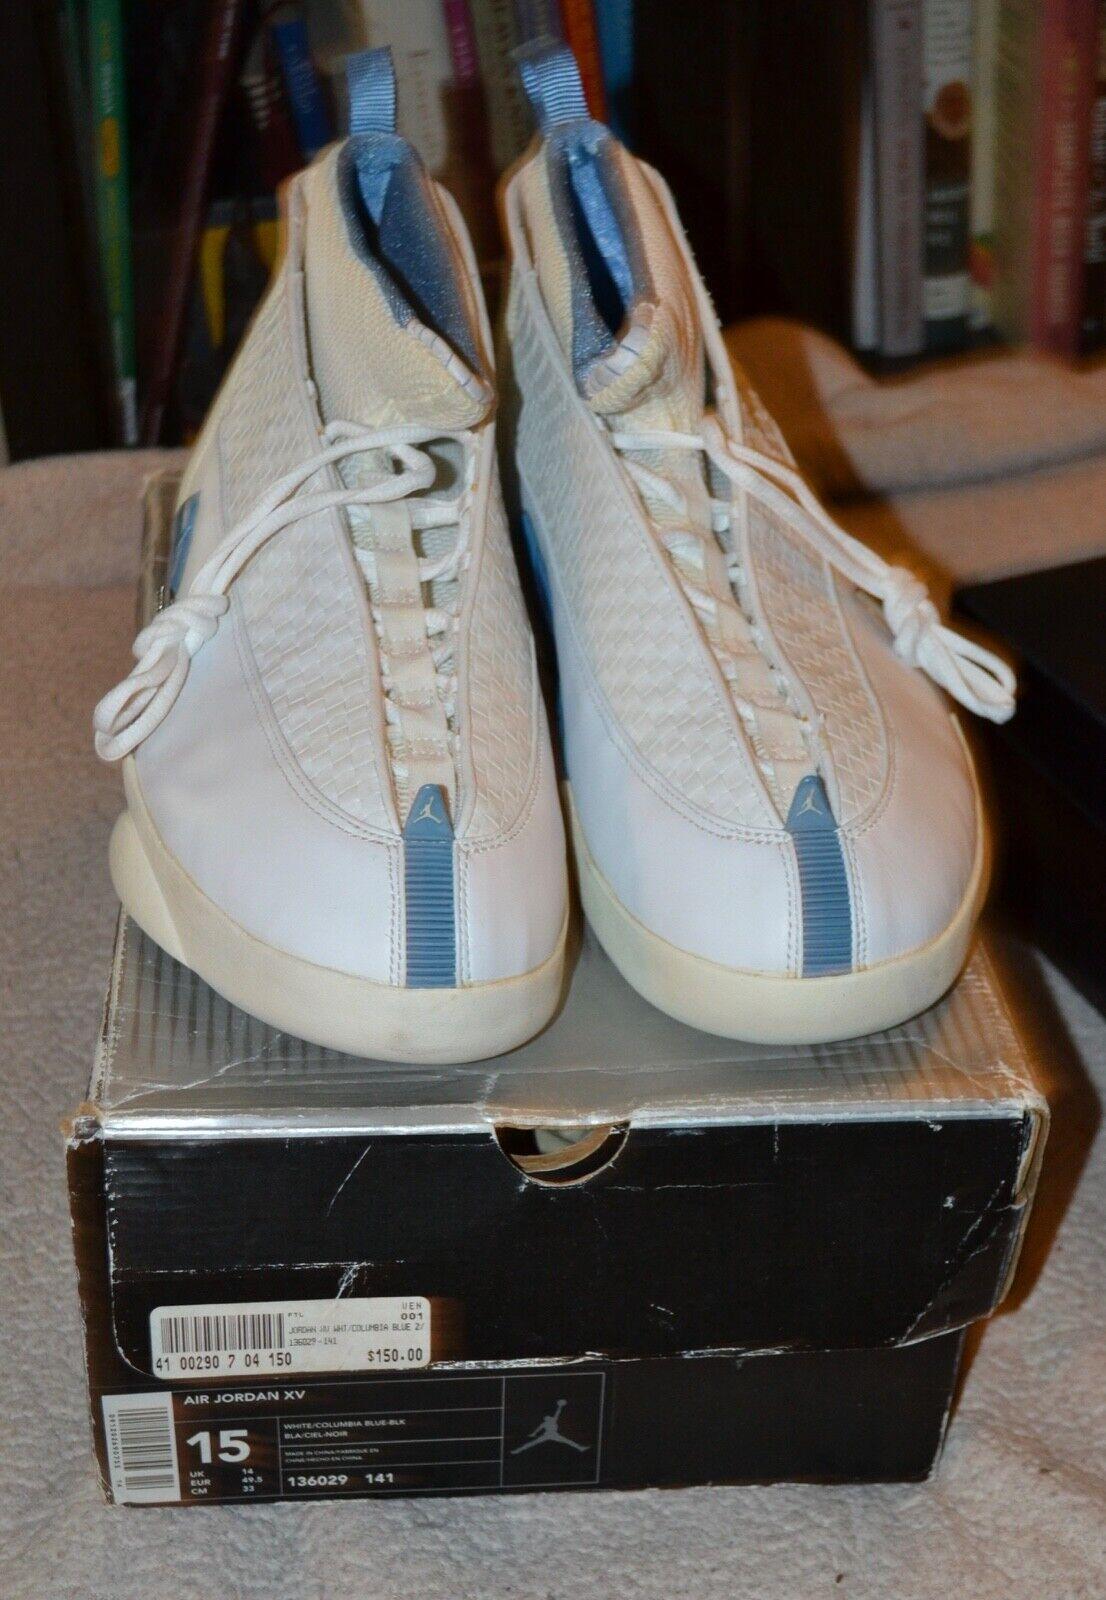 Nike Air Jordan 15   XV White Columbia bluee -BLK Men's 136029-141 Size 15